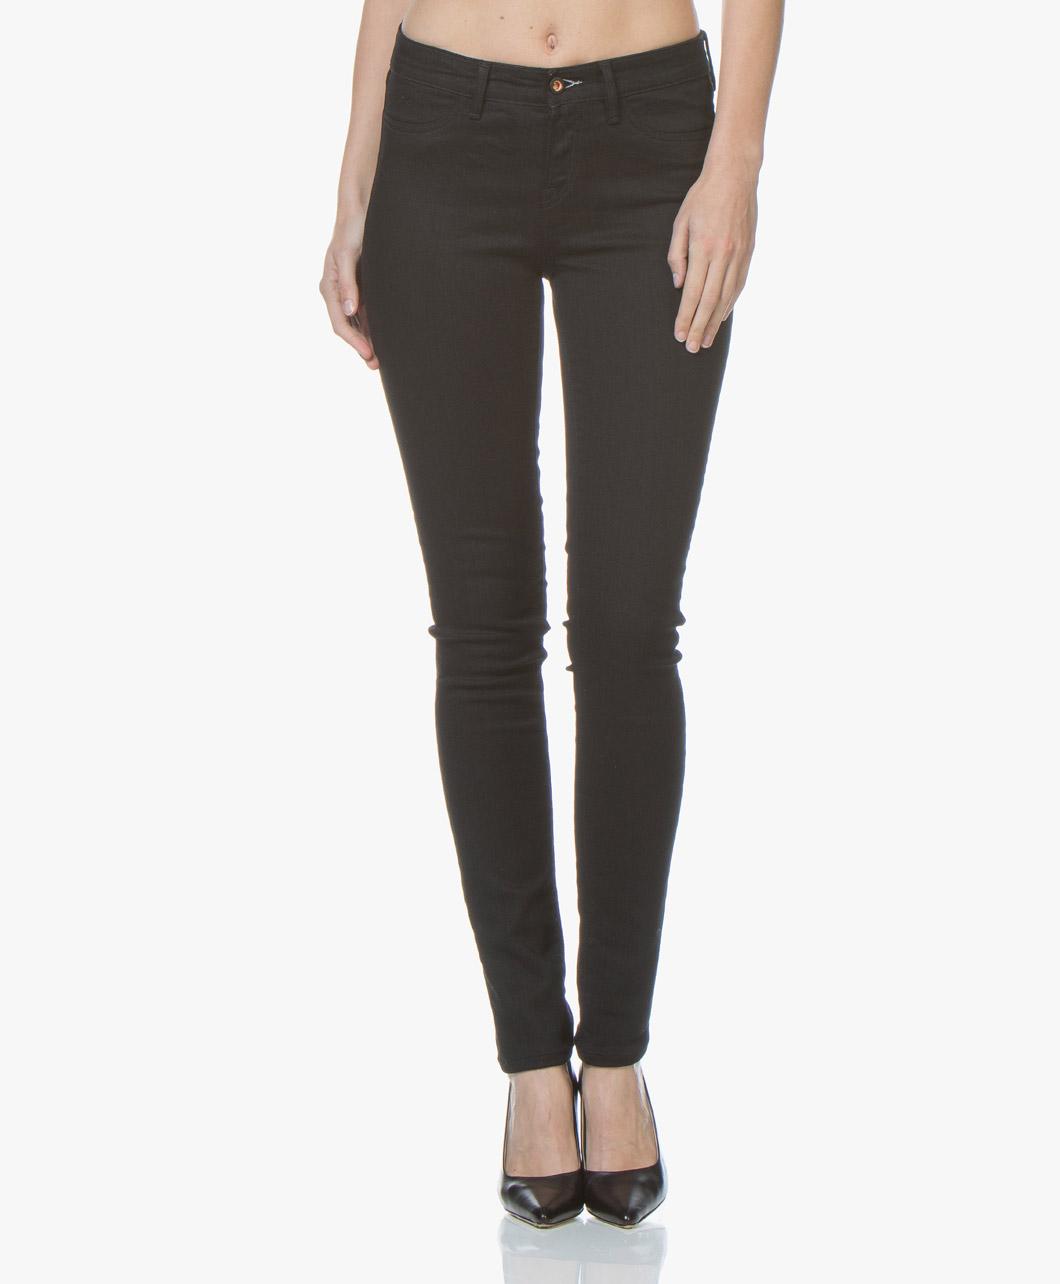 Afbeelding van Denham Jeans Spray B30 Skinny in Zwart